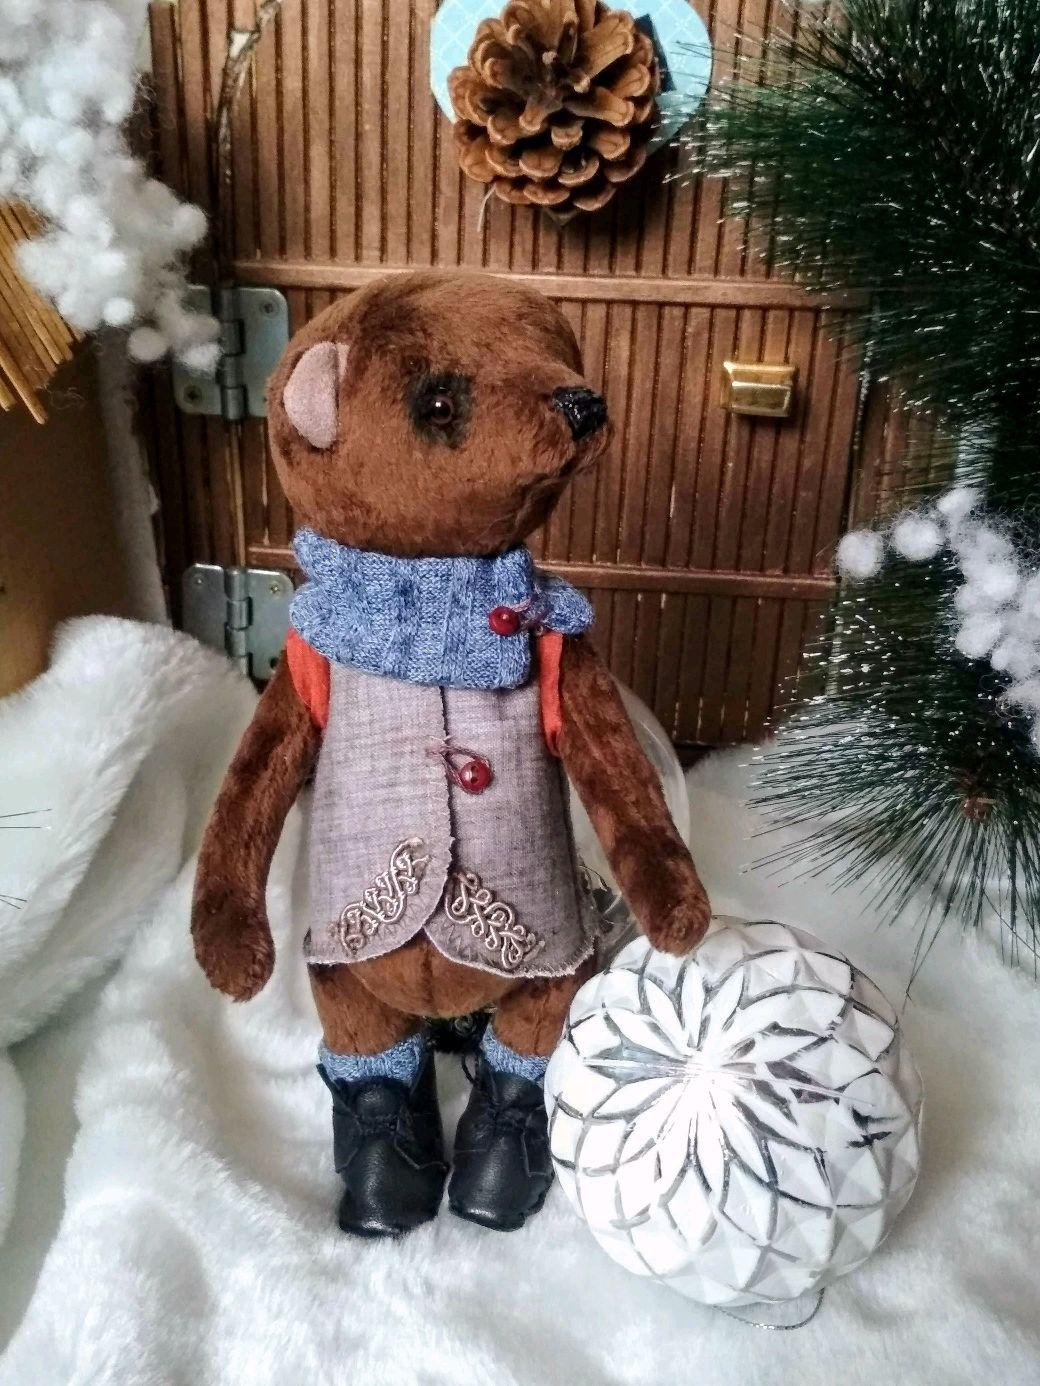 Мишка- Тедди, Иван Пирогов - серьезный мишка ), Мишки Тедди, Новосибирск,  Фото №1